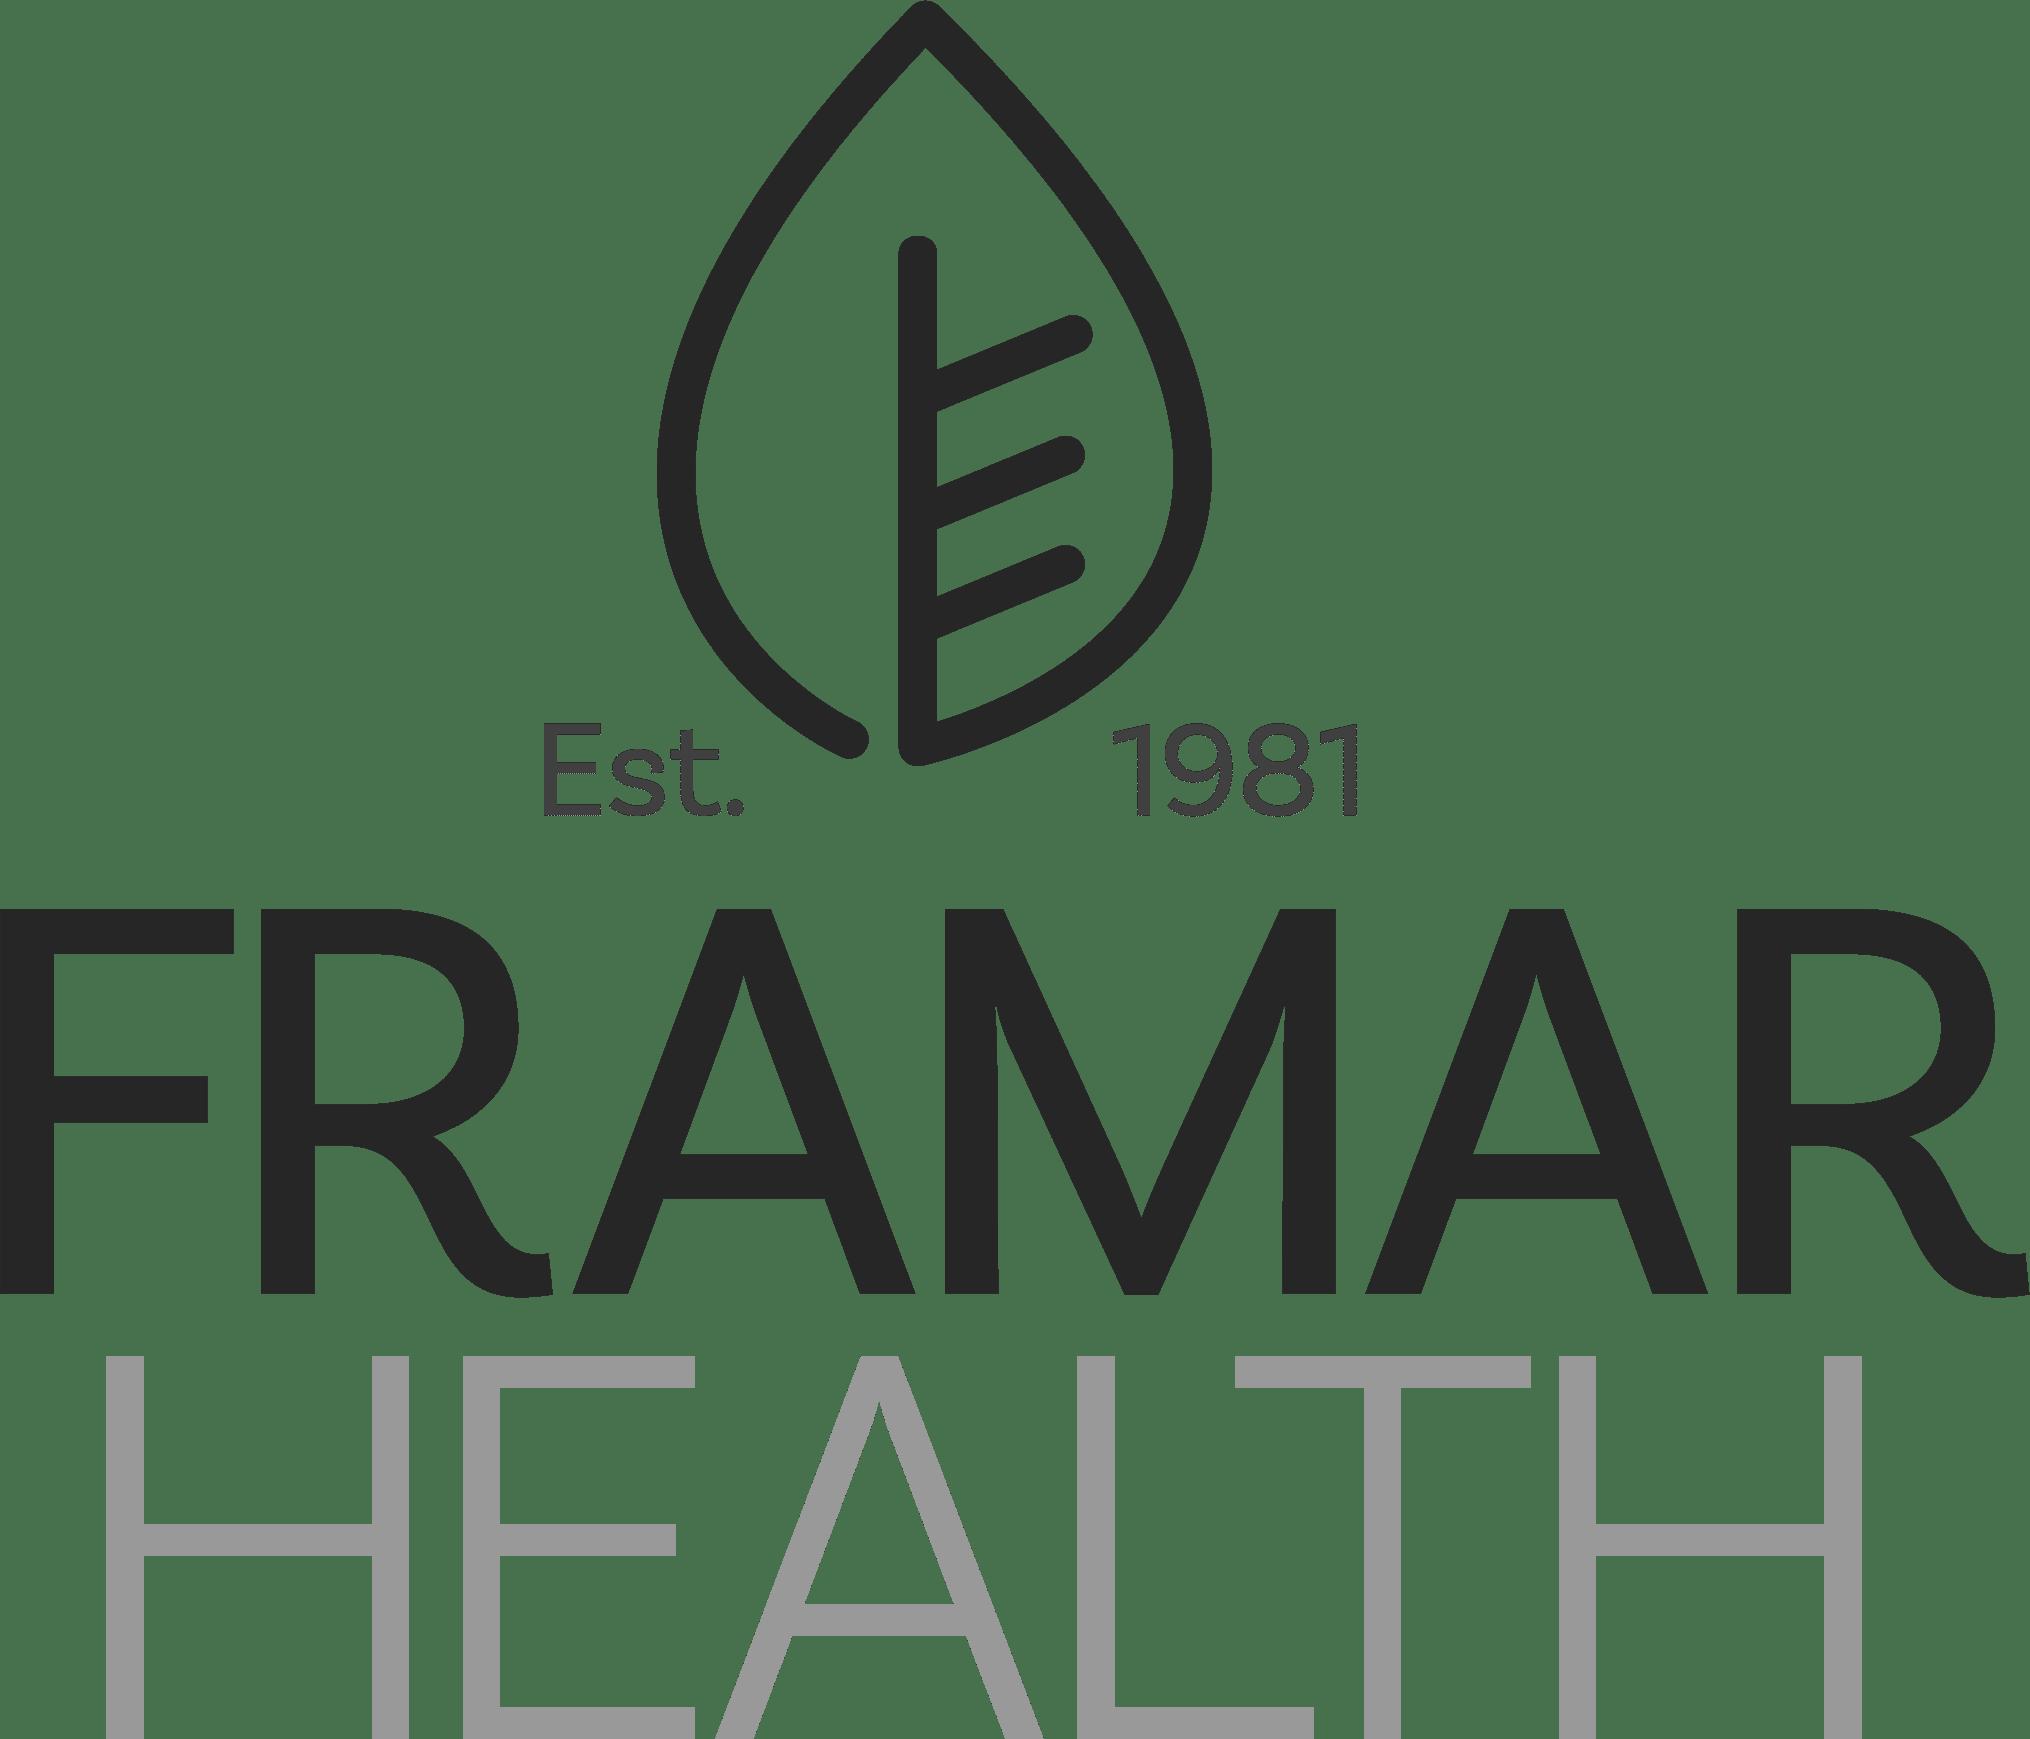 Brand Design for Framar Health By Tierna Byrne